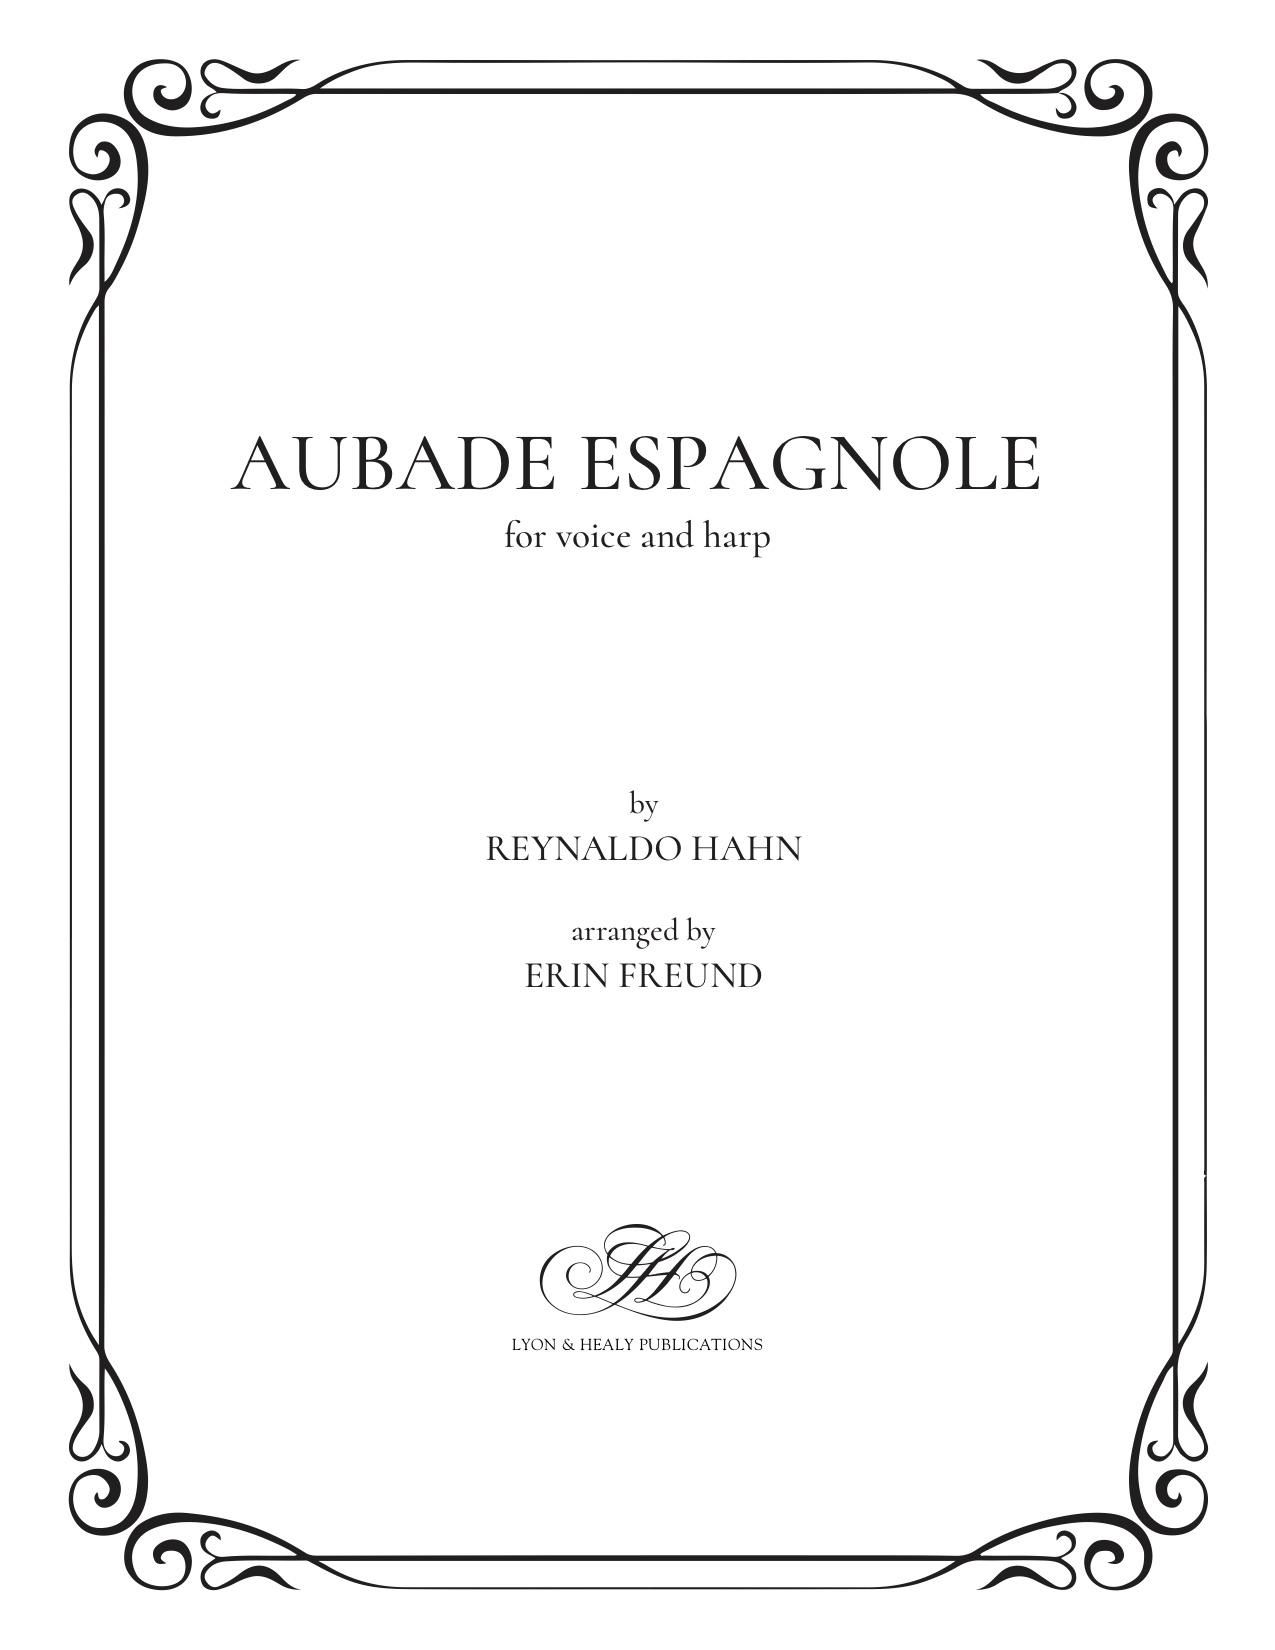 Audbade Espagnole cover.jpg